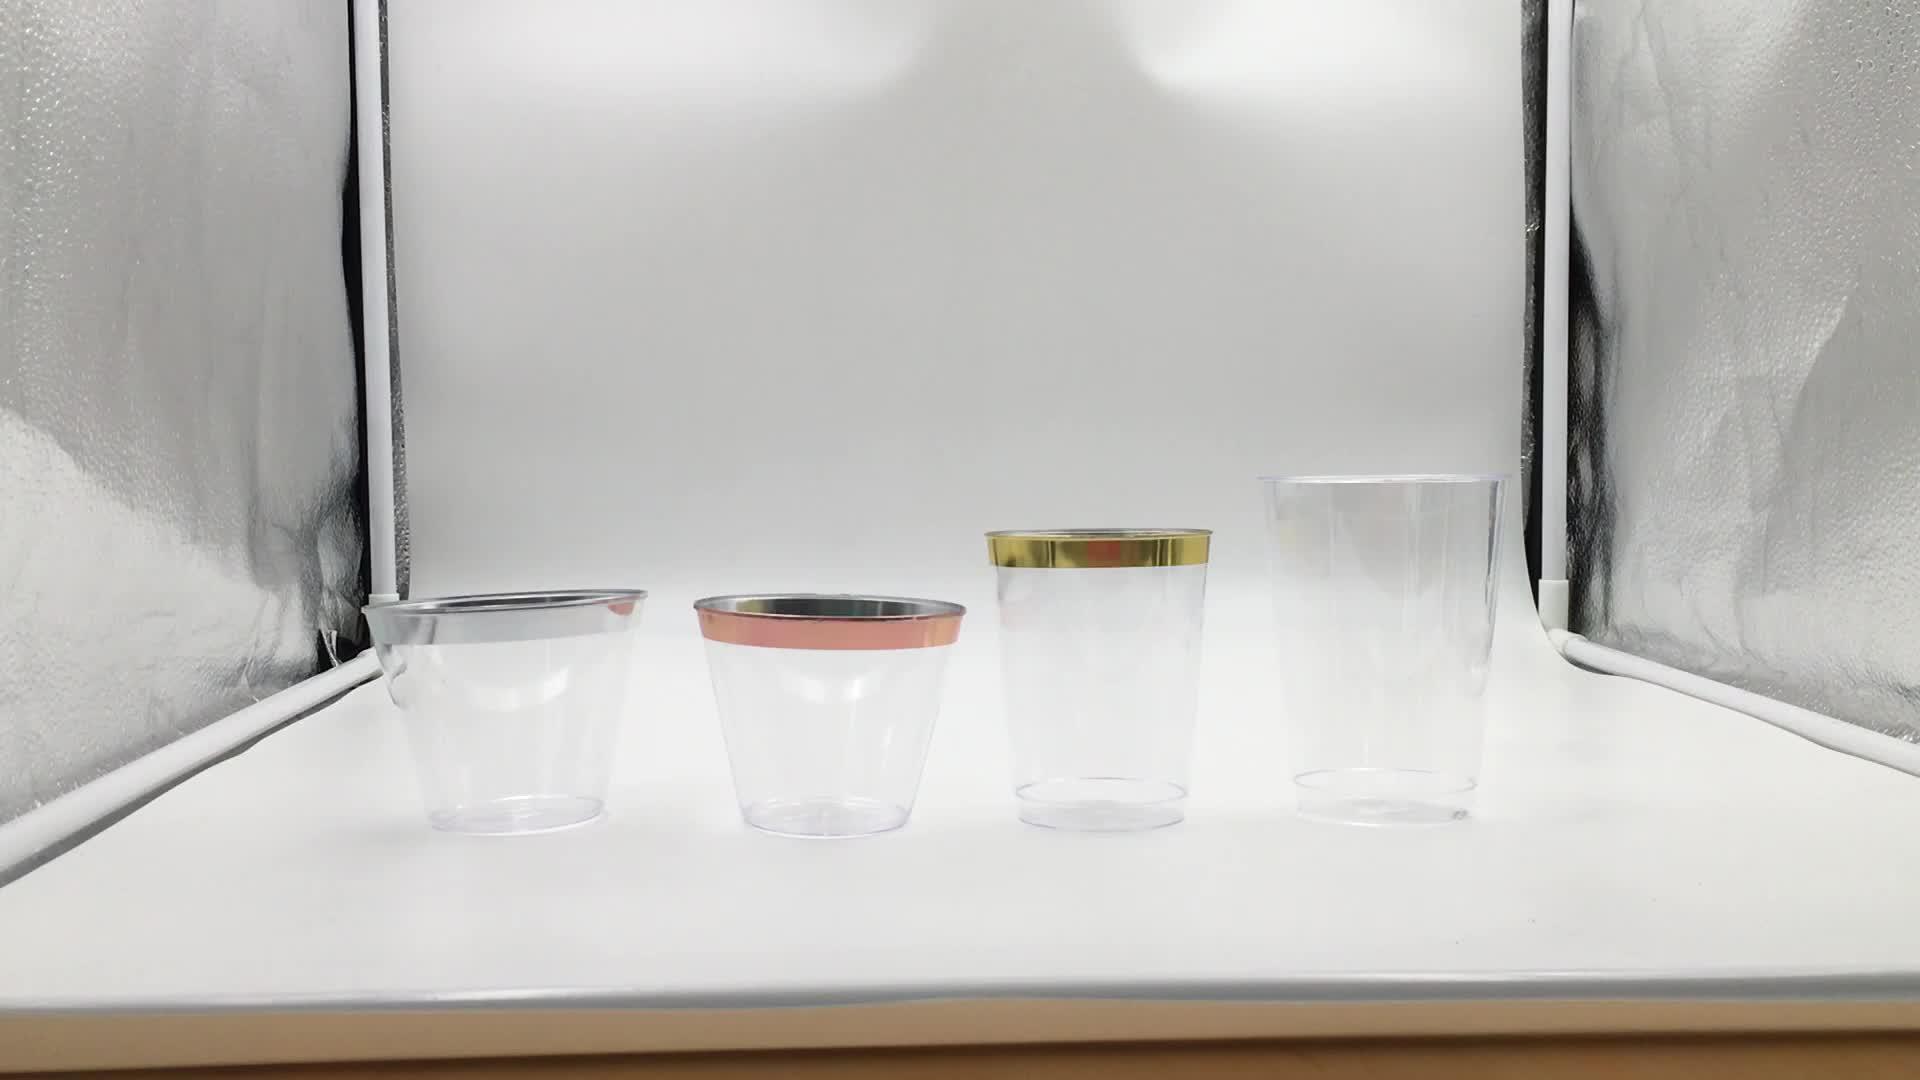 9 OZ 파티 일회용 골드 림 플라스틱 컵